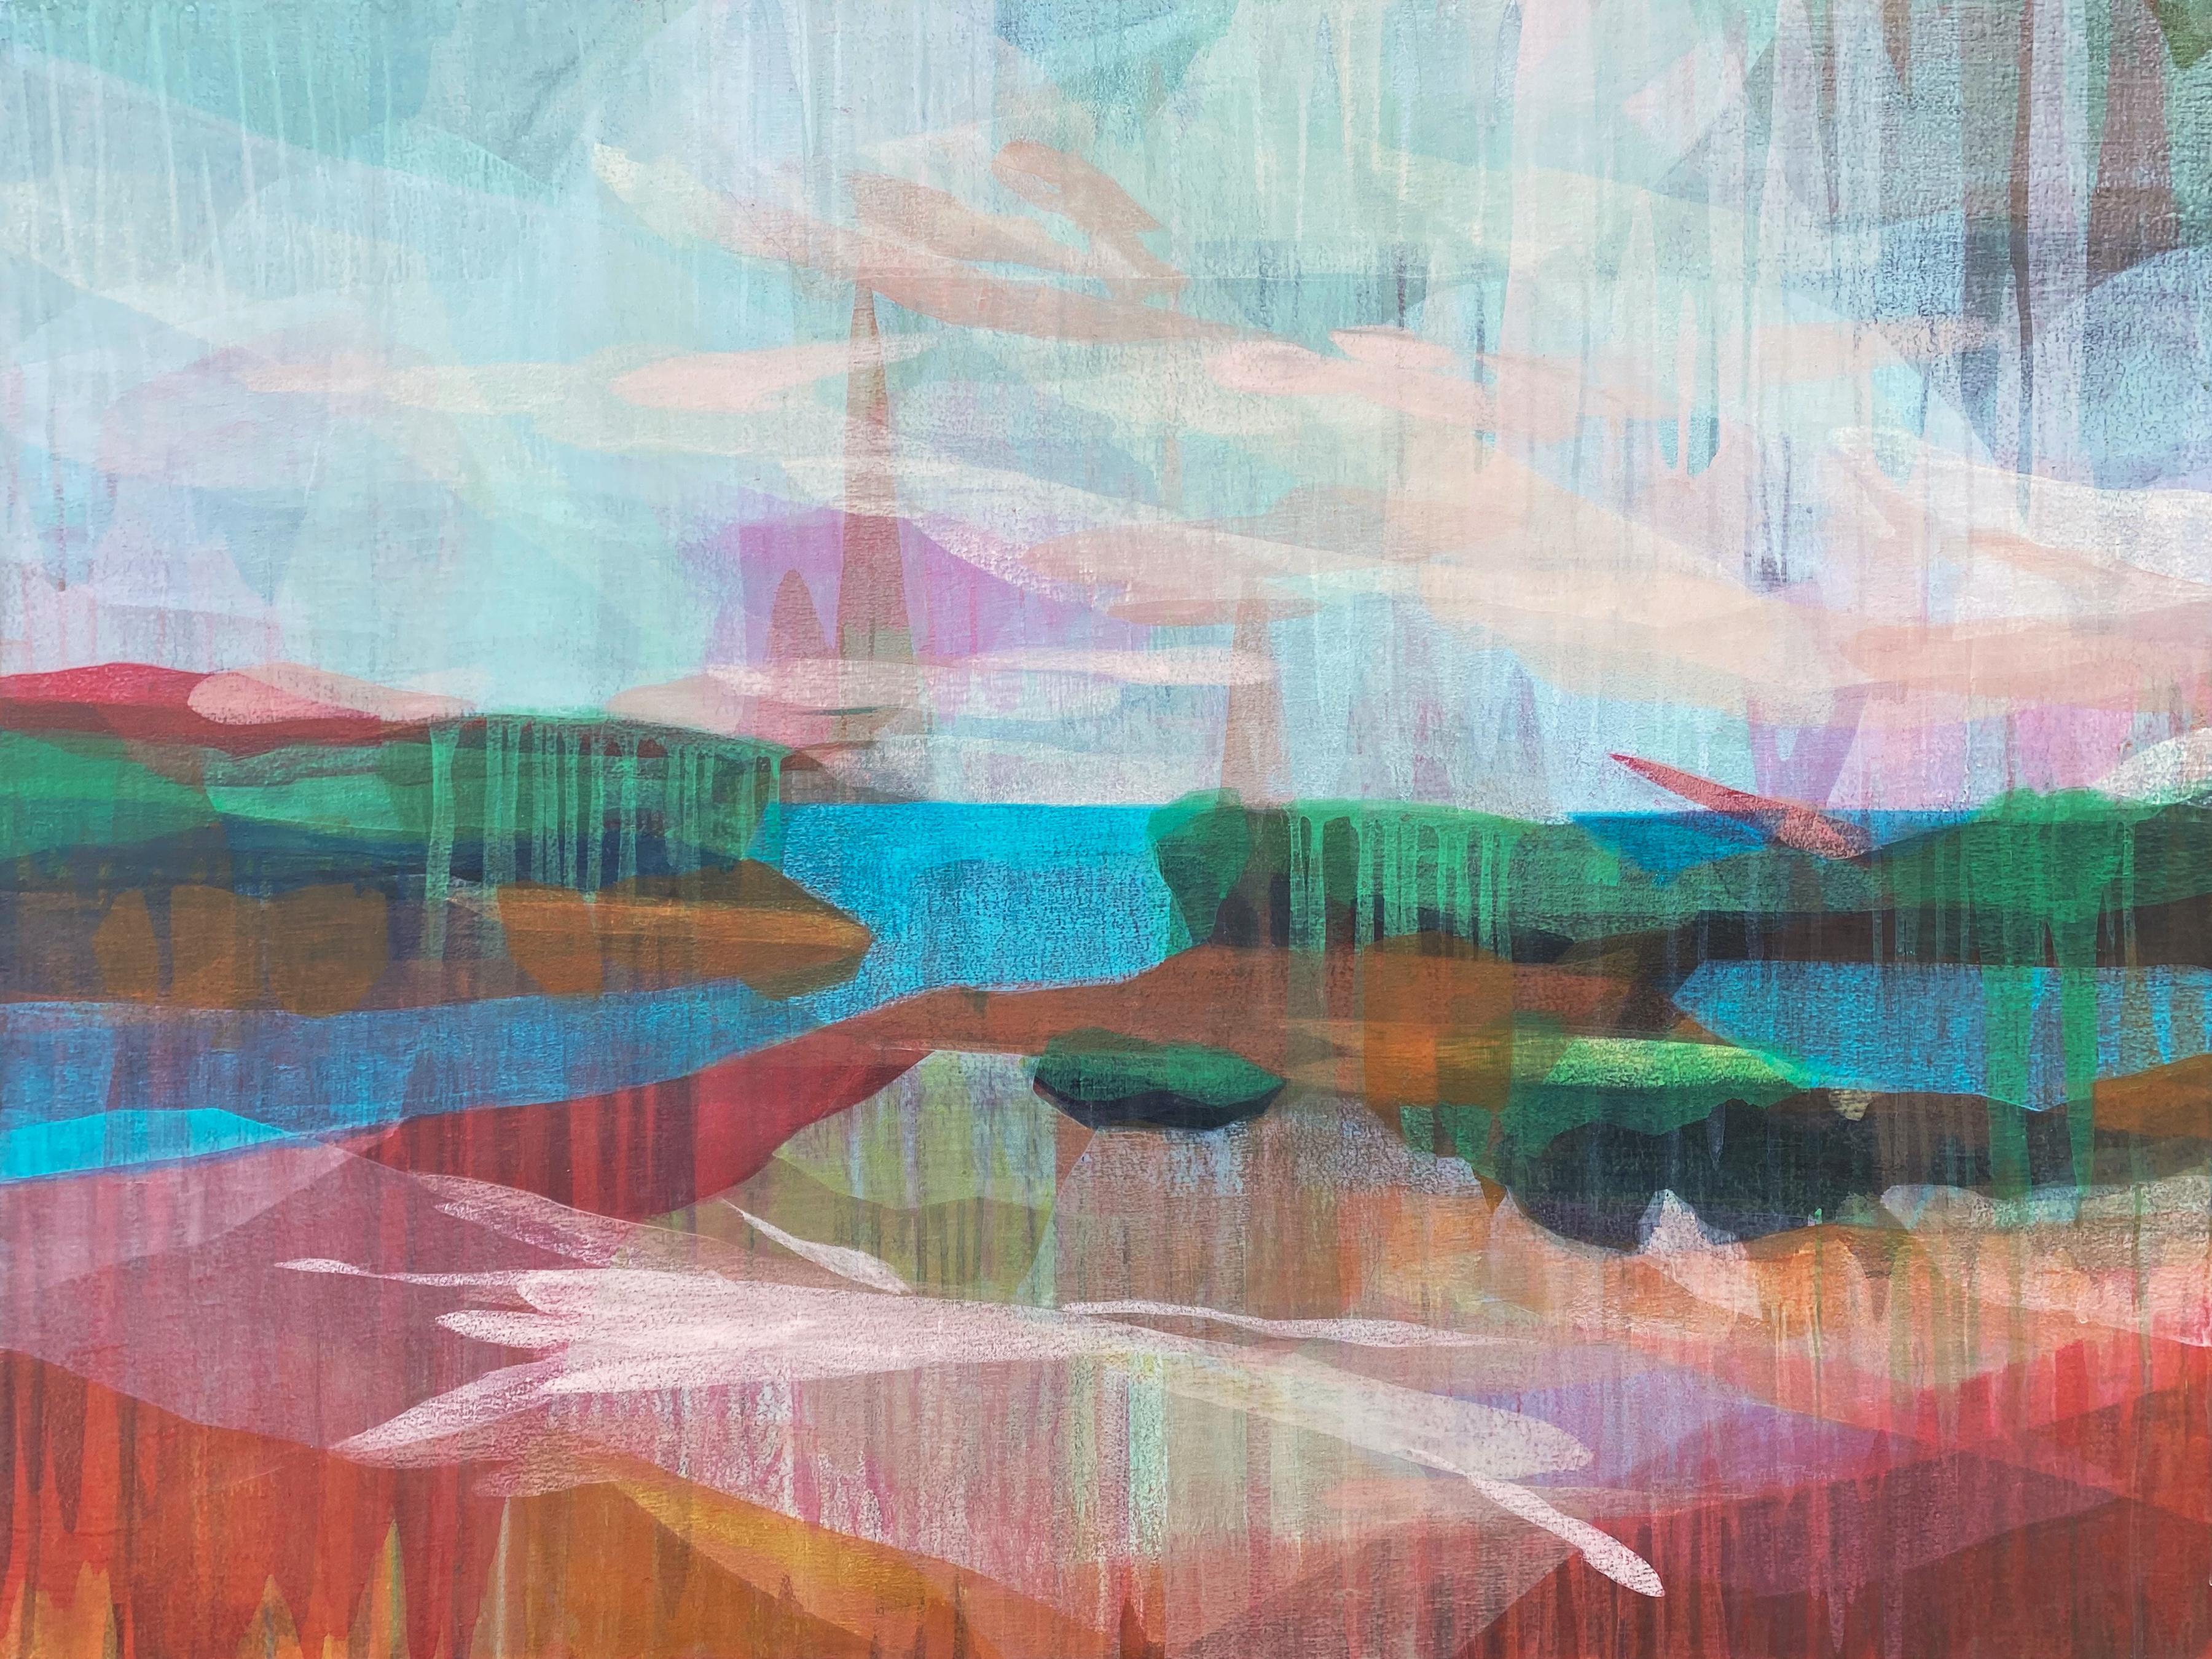 """(sequoia) double marsh"" - colorful abstract landscape - marsh - Diebenkorn"